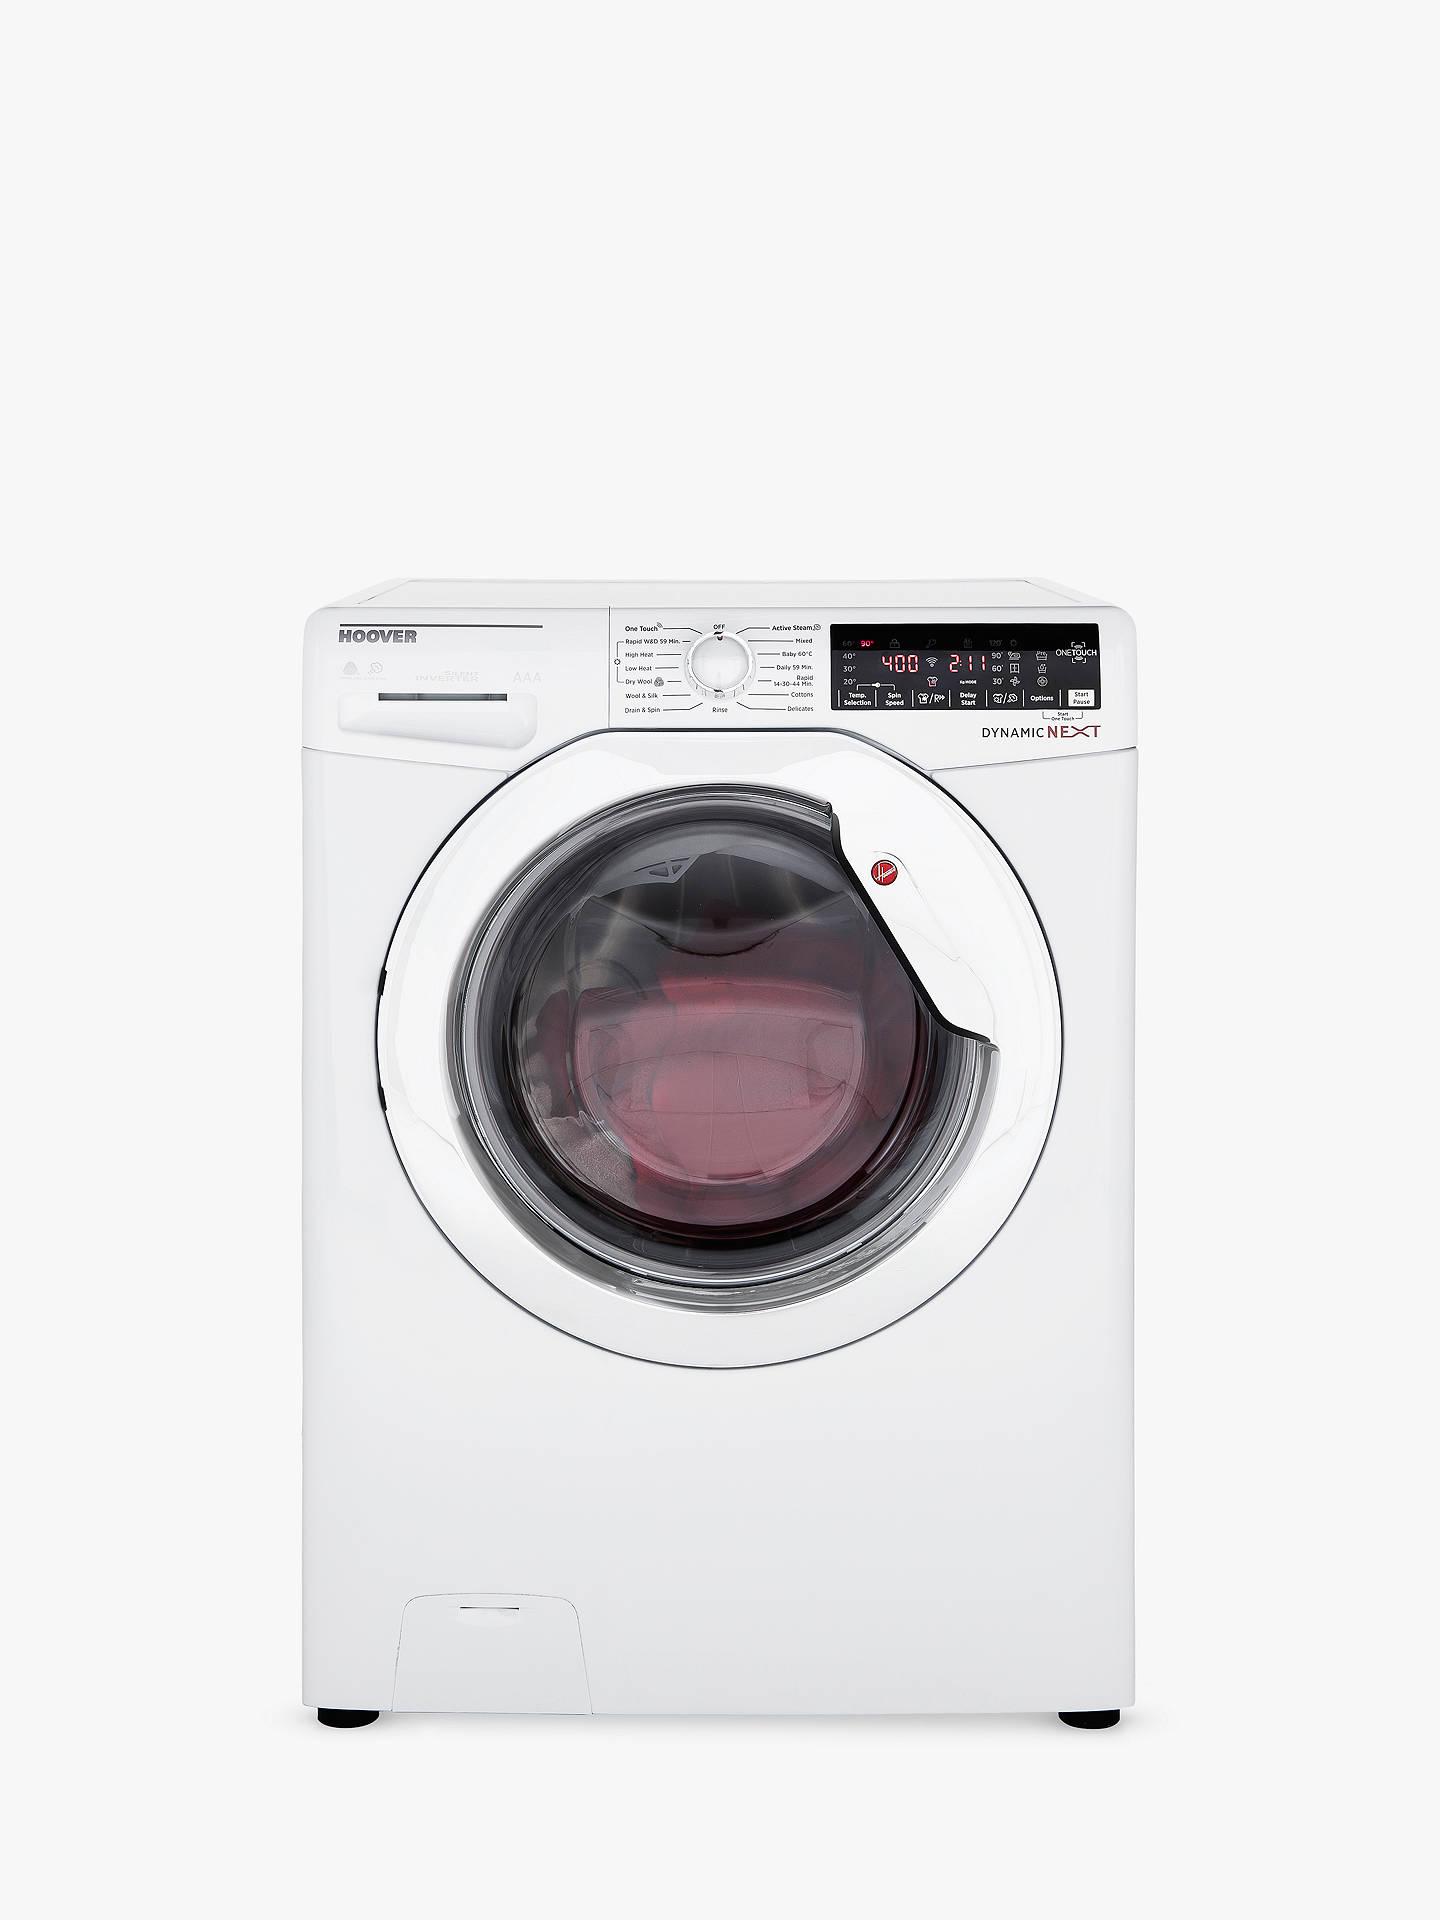 Hoover Dynamic Next Wdxoa 4106hc 80 Washer Dryer 10kg Wash 6kg Dry Washing Machine Wiring Diagram Buyhoover Load